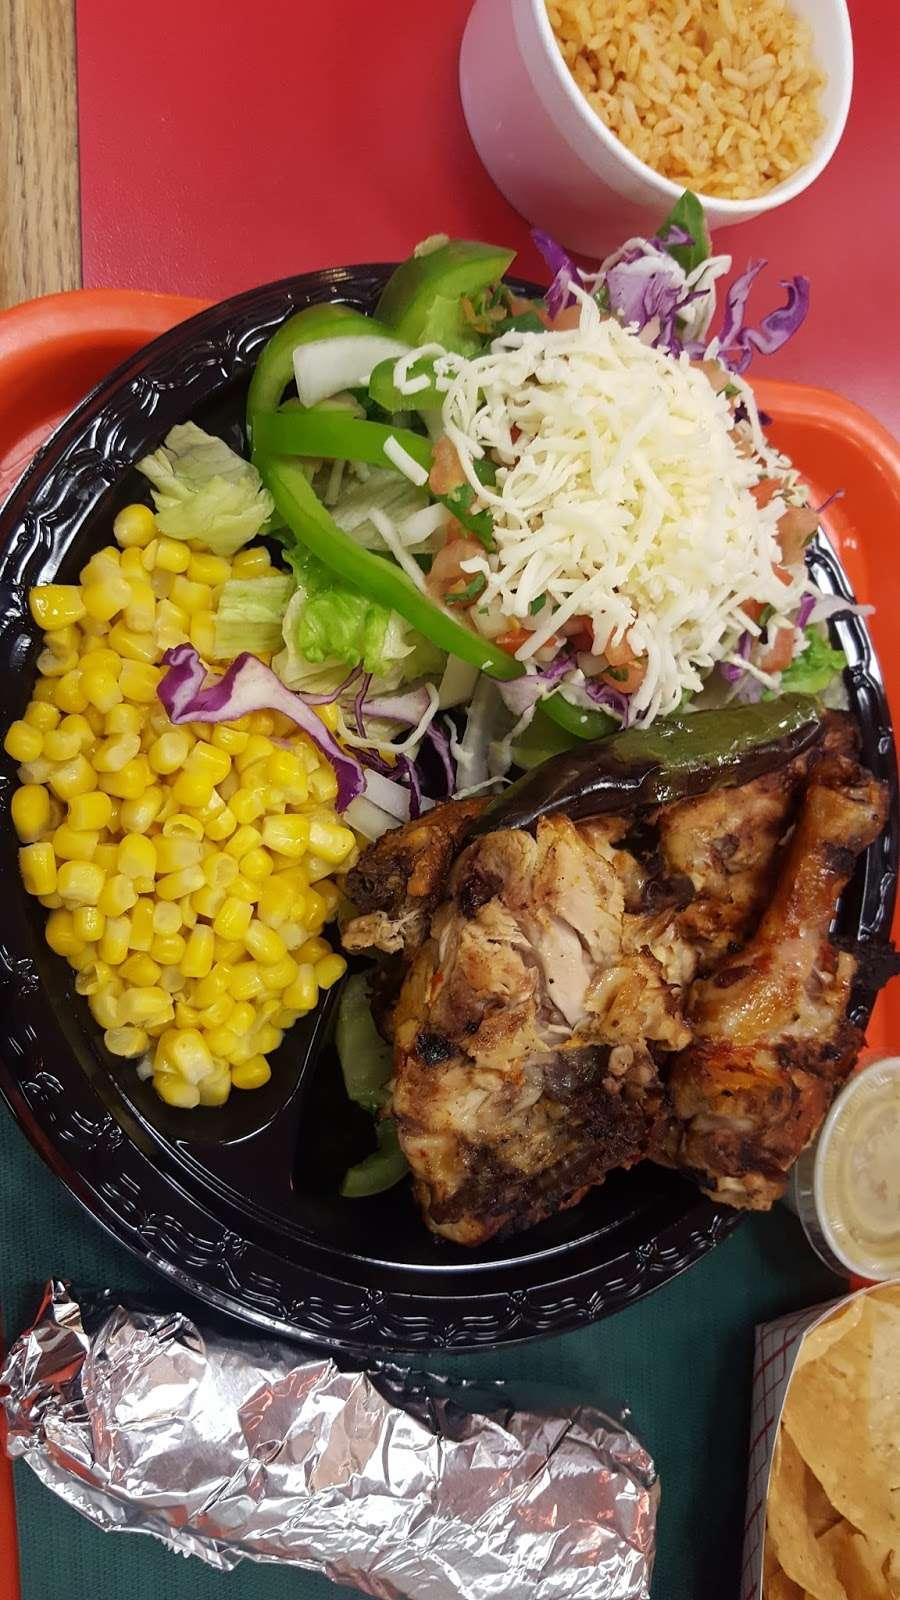 Taco Plus - restaurant  | Photo 4 of 10 | Address: 1525 S Bundy Dr, Los Angeles, CA 90025, USA | Phone: (310) 207-0793